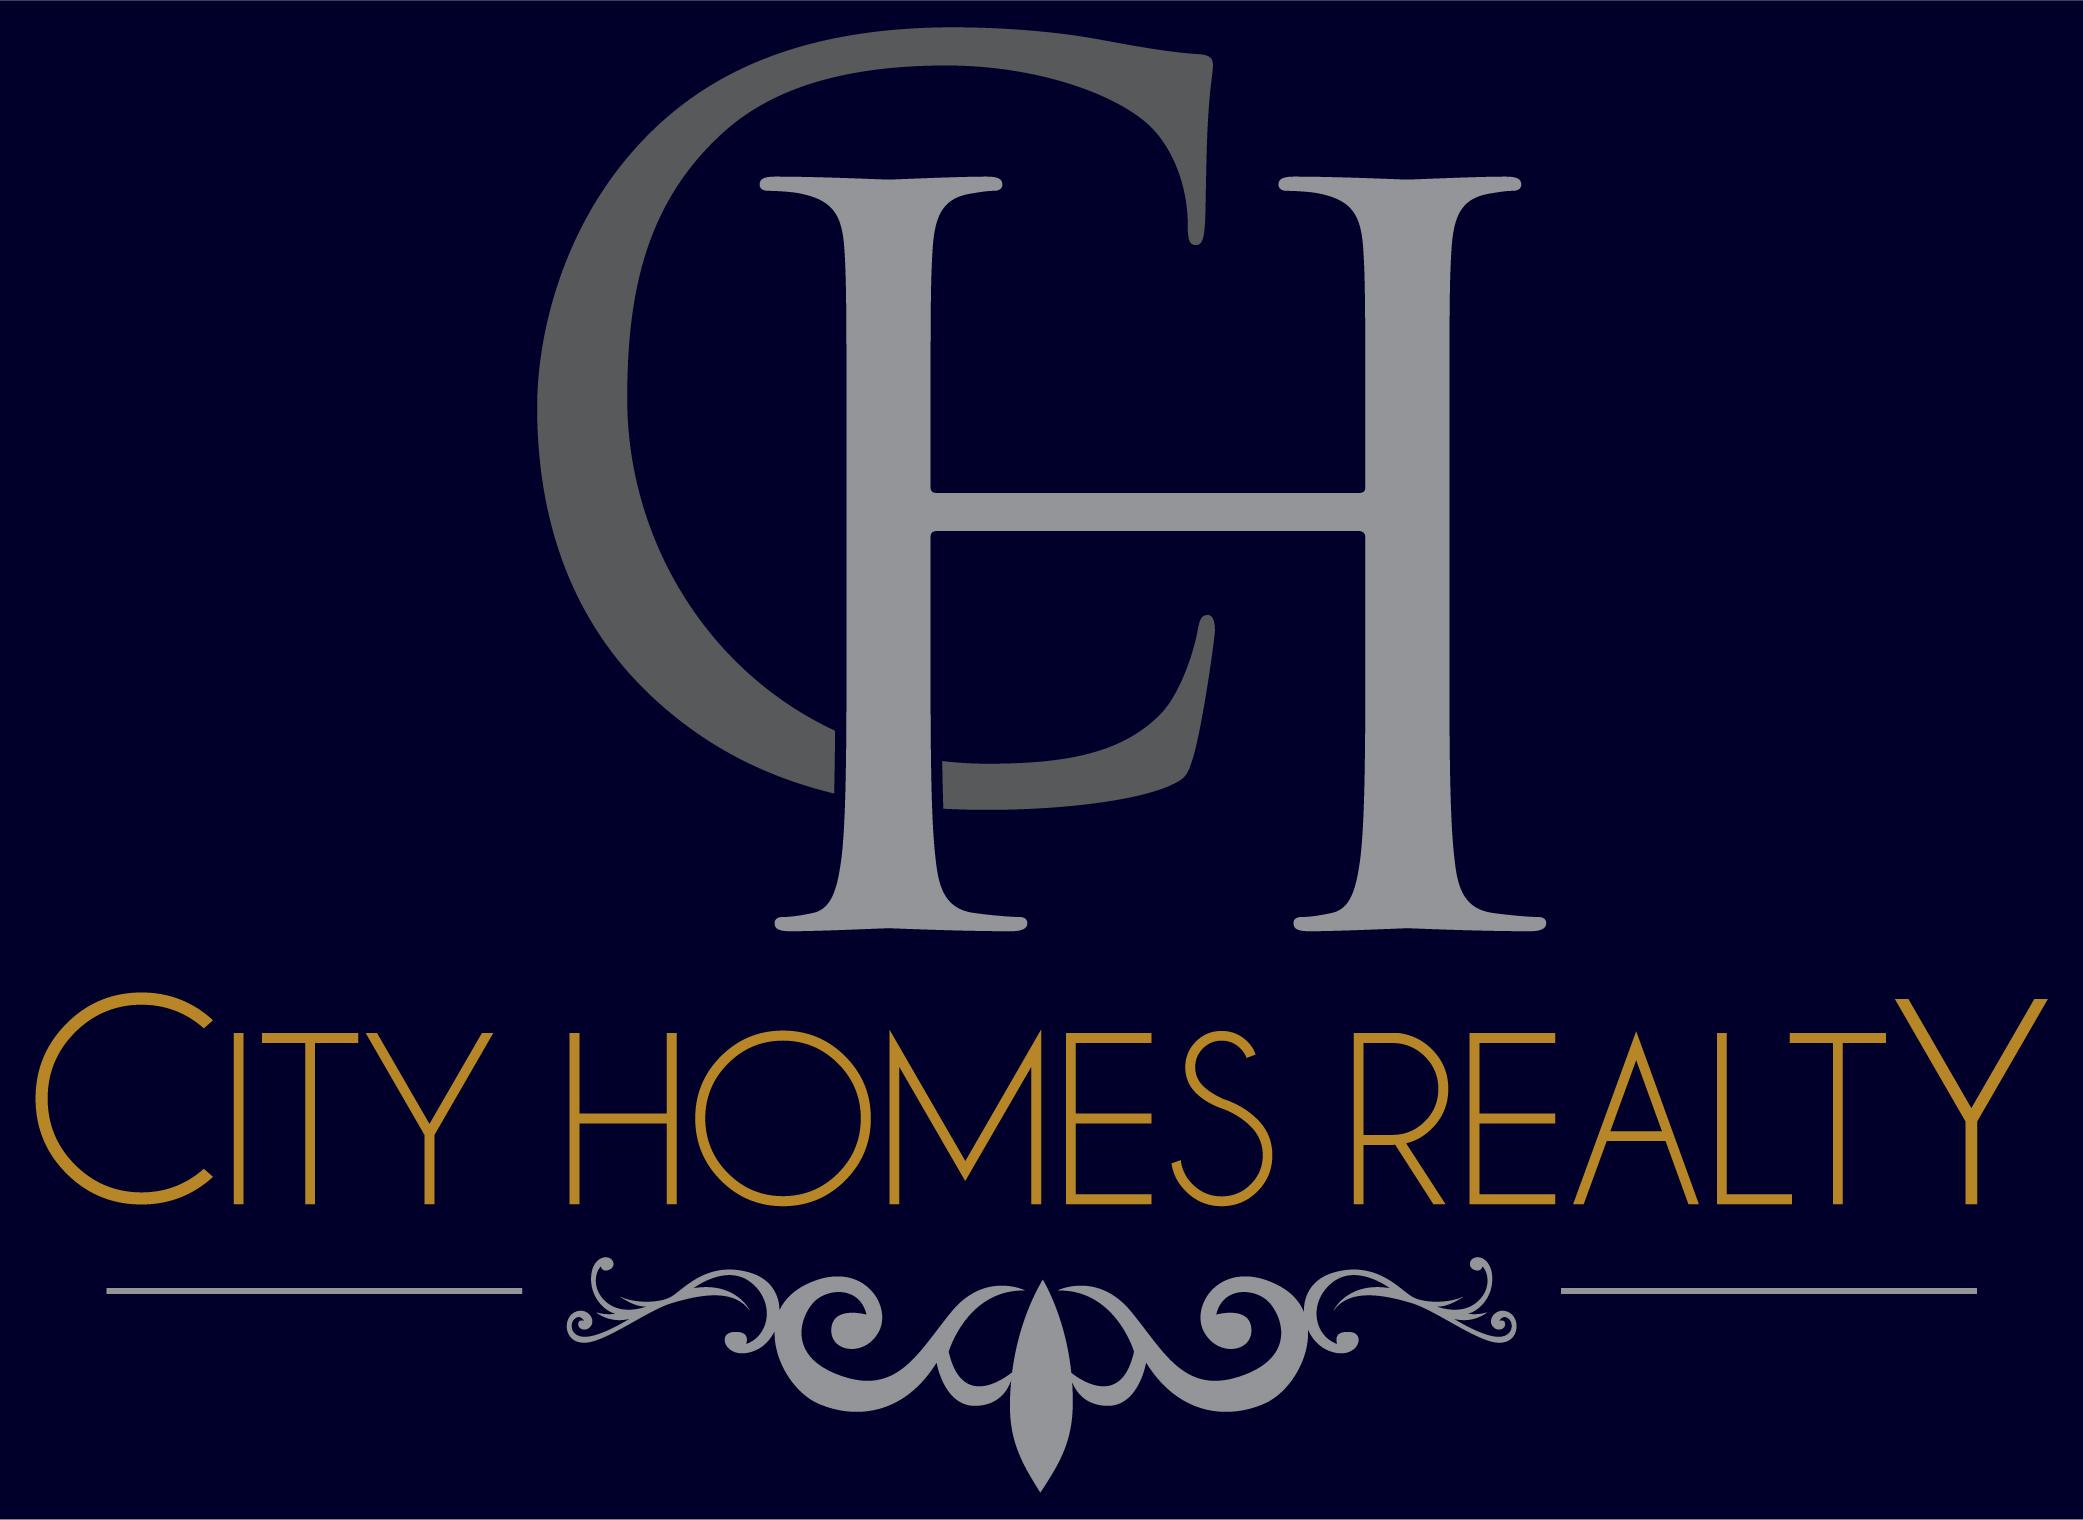 City Homes Realty Group LLC